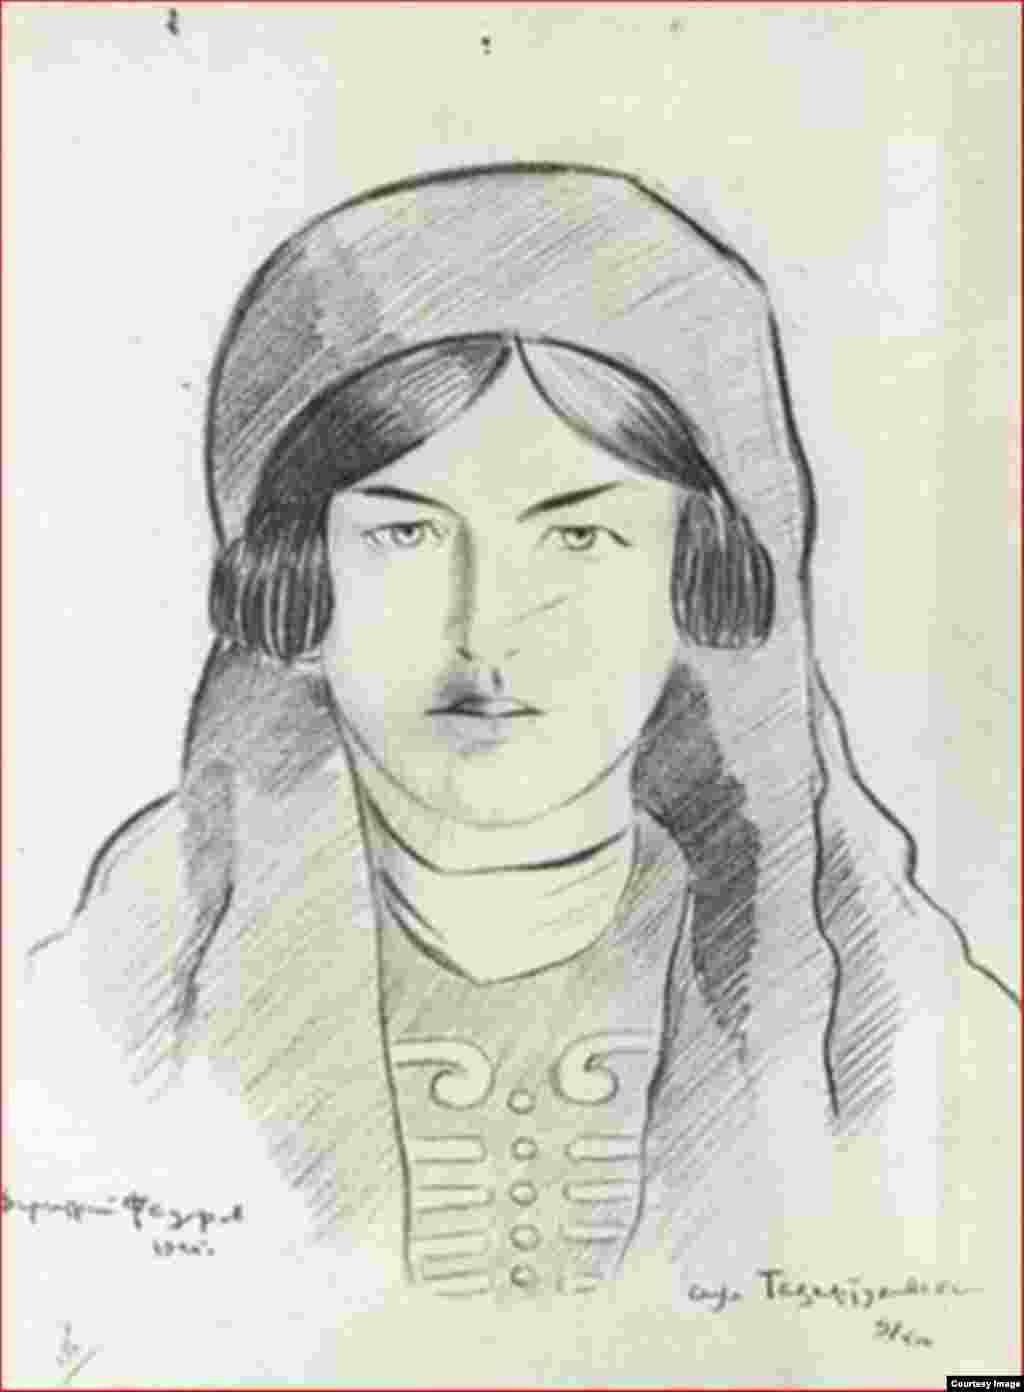 Федоров Д.С. Черкешенка. Аул Тазартуковский. Черкесия. 1925 г.